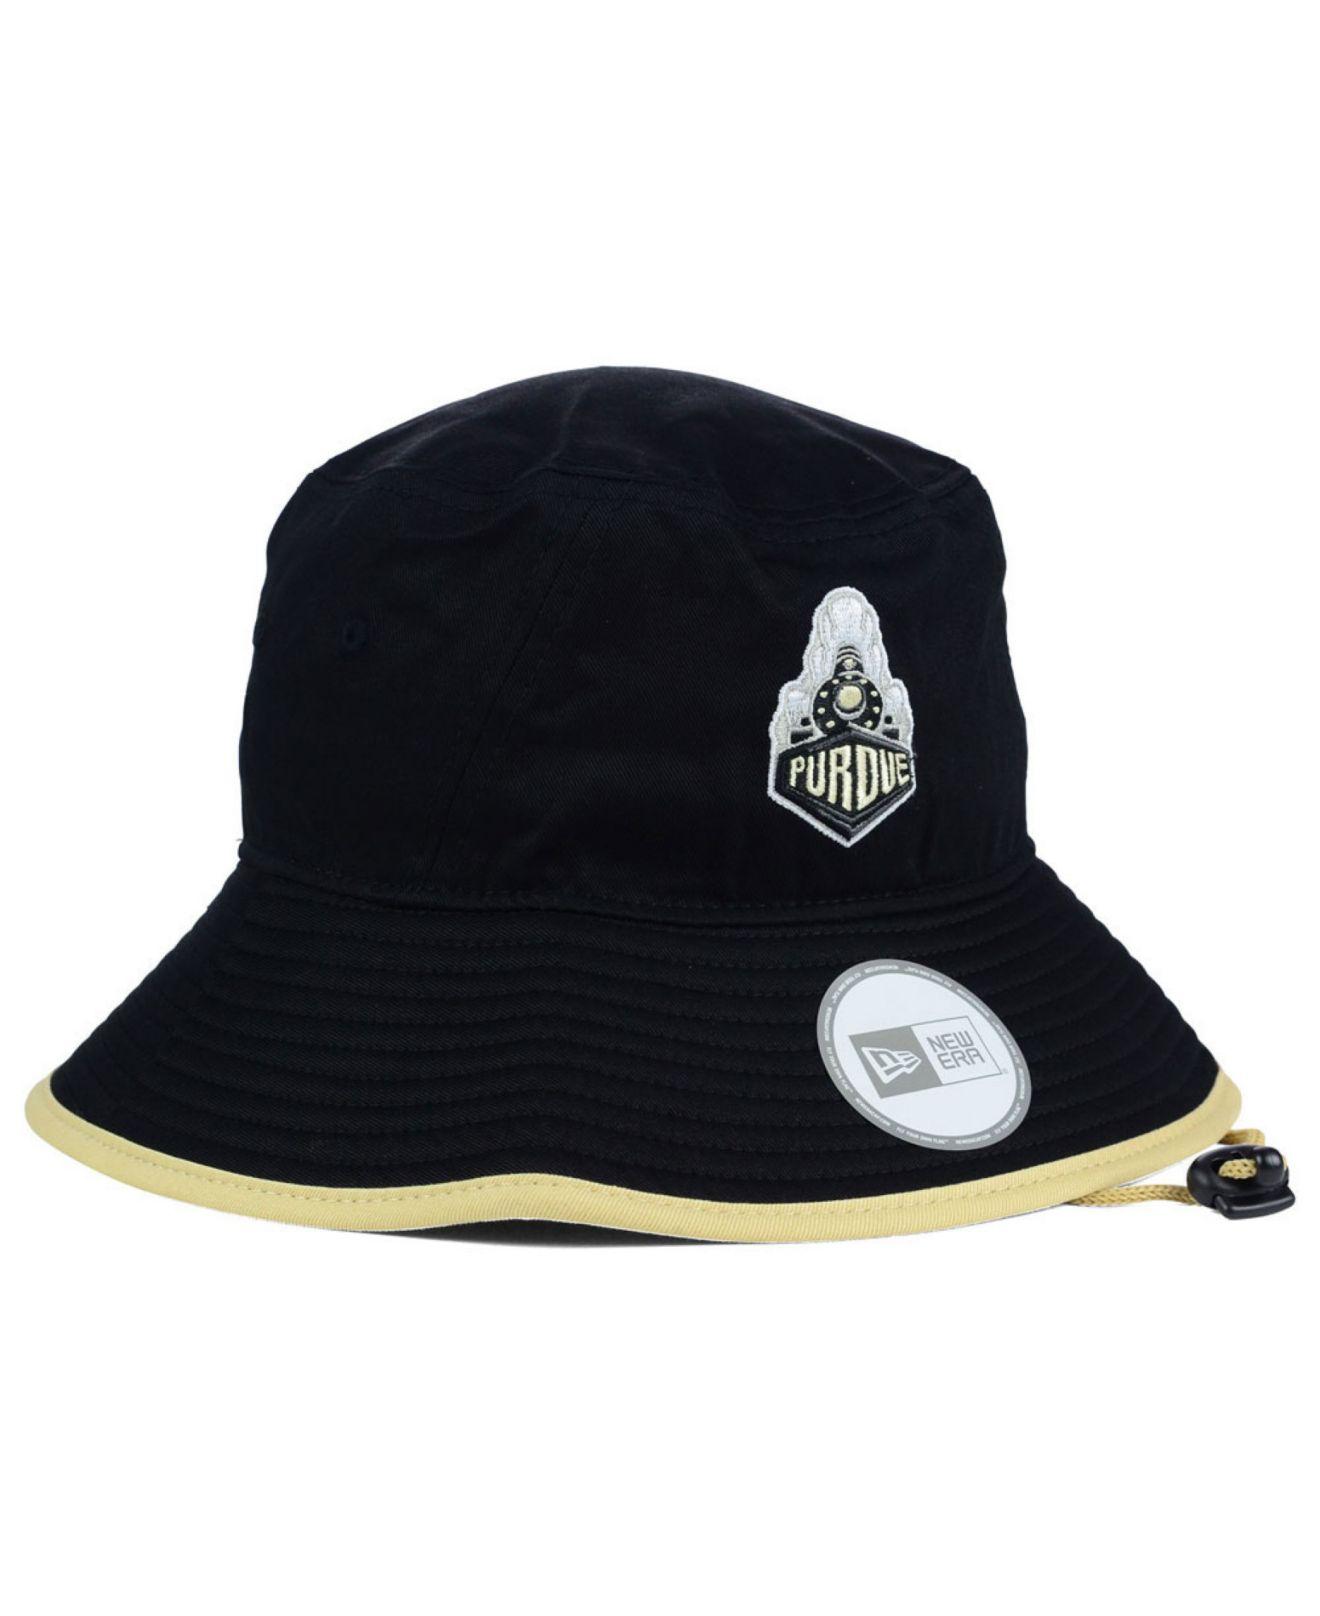 dfb80036171 Lyst - KTZ Purdue Boilermakers Tip Bucket Hat in Black for Men